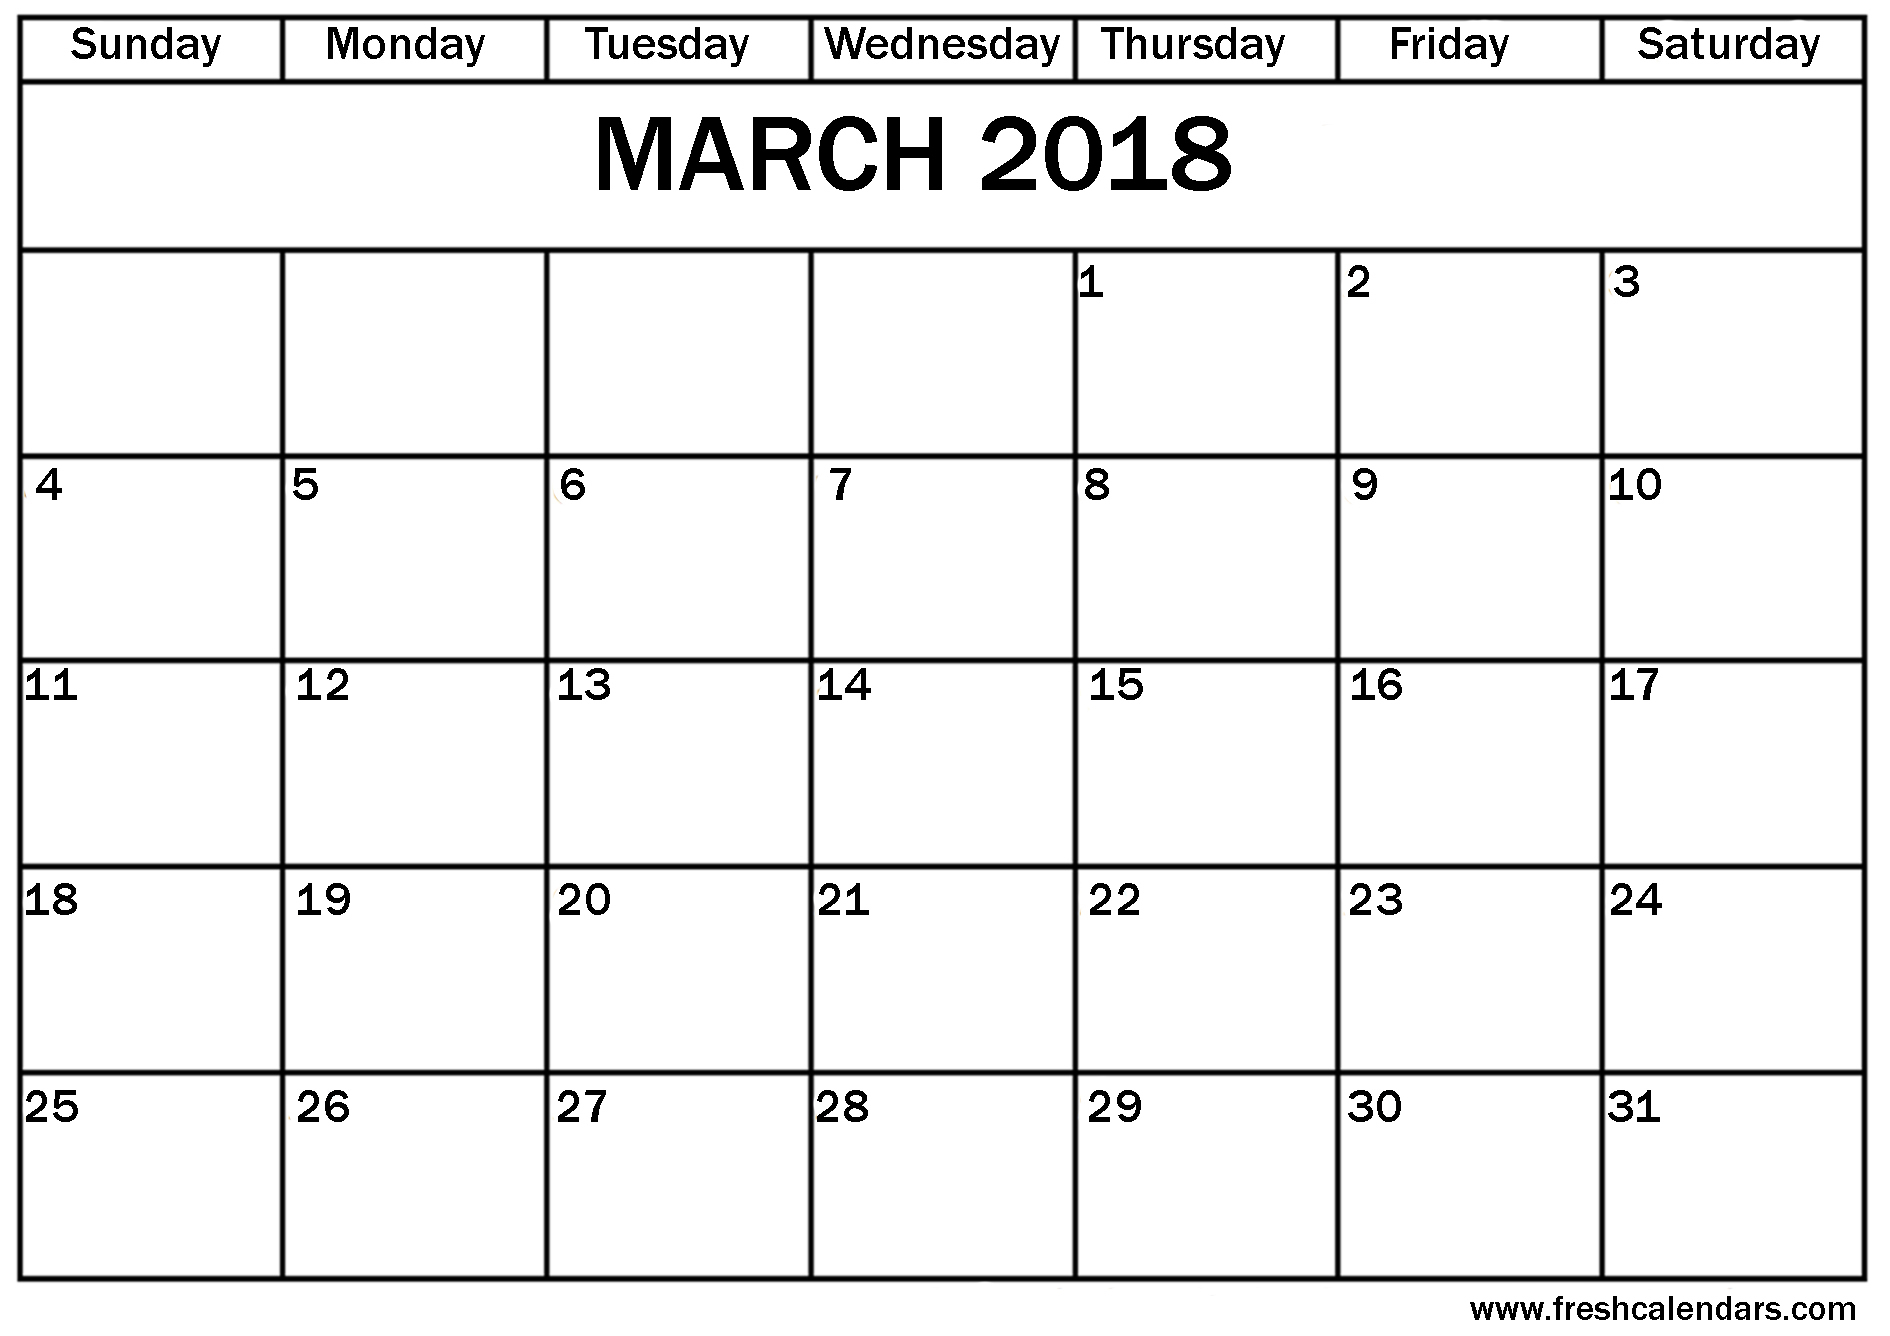 March 2018 Calendar Printable - Fresh Calendars regarding March Calendar Printable Template